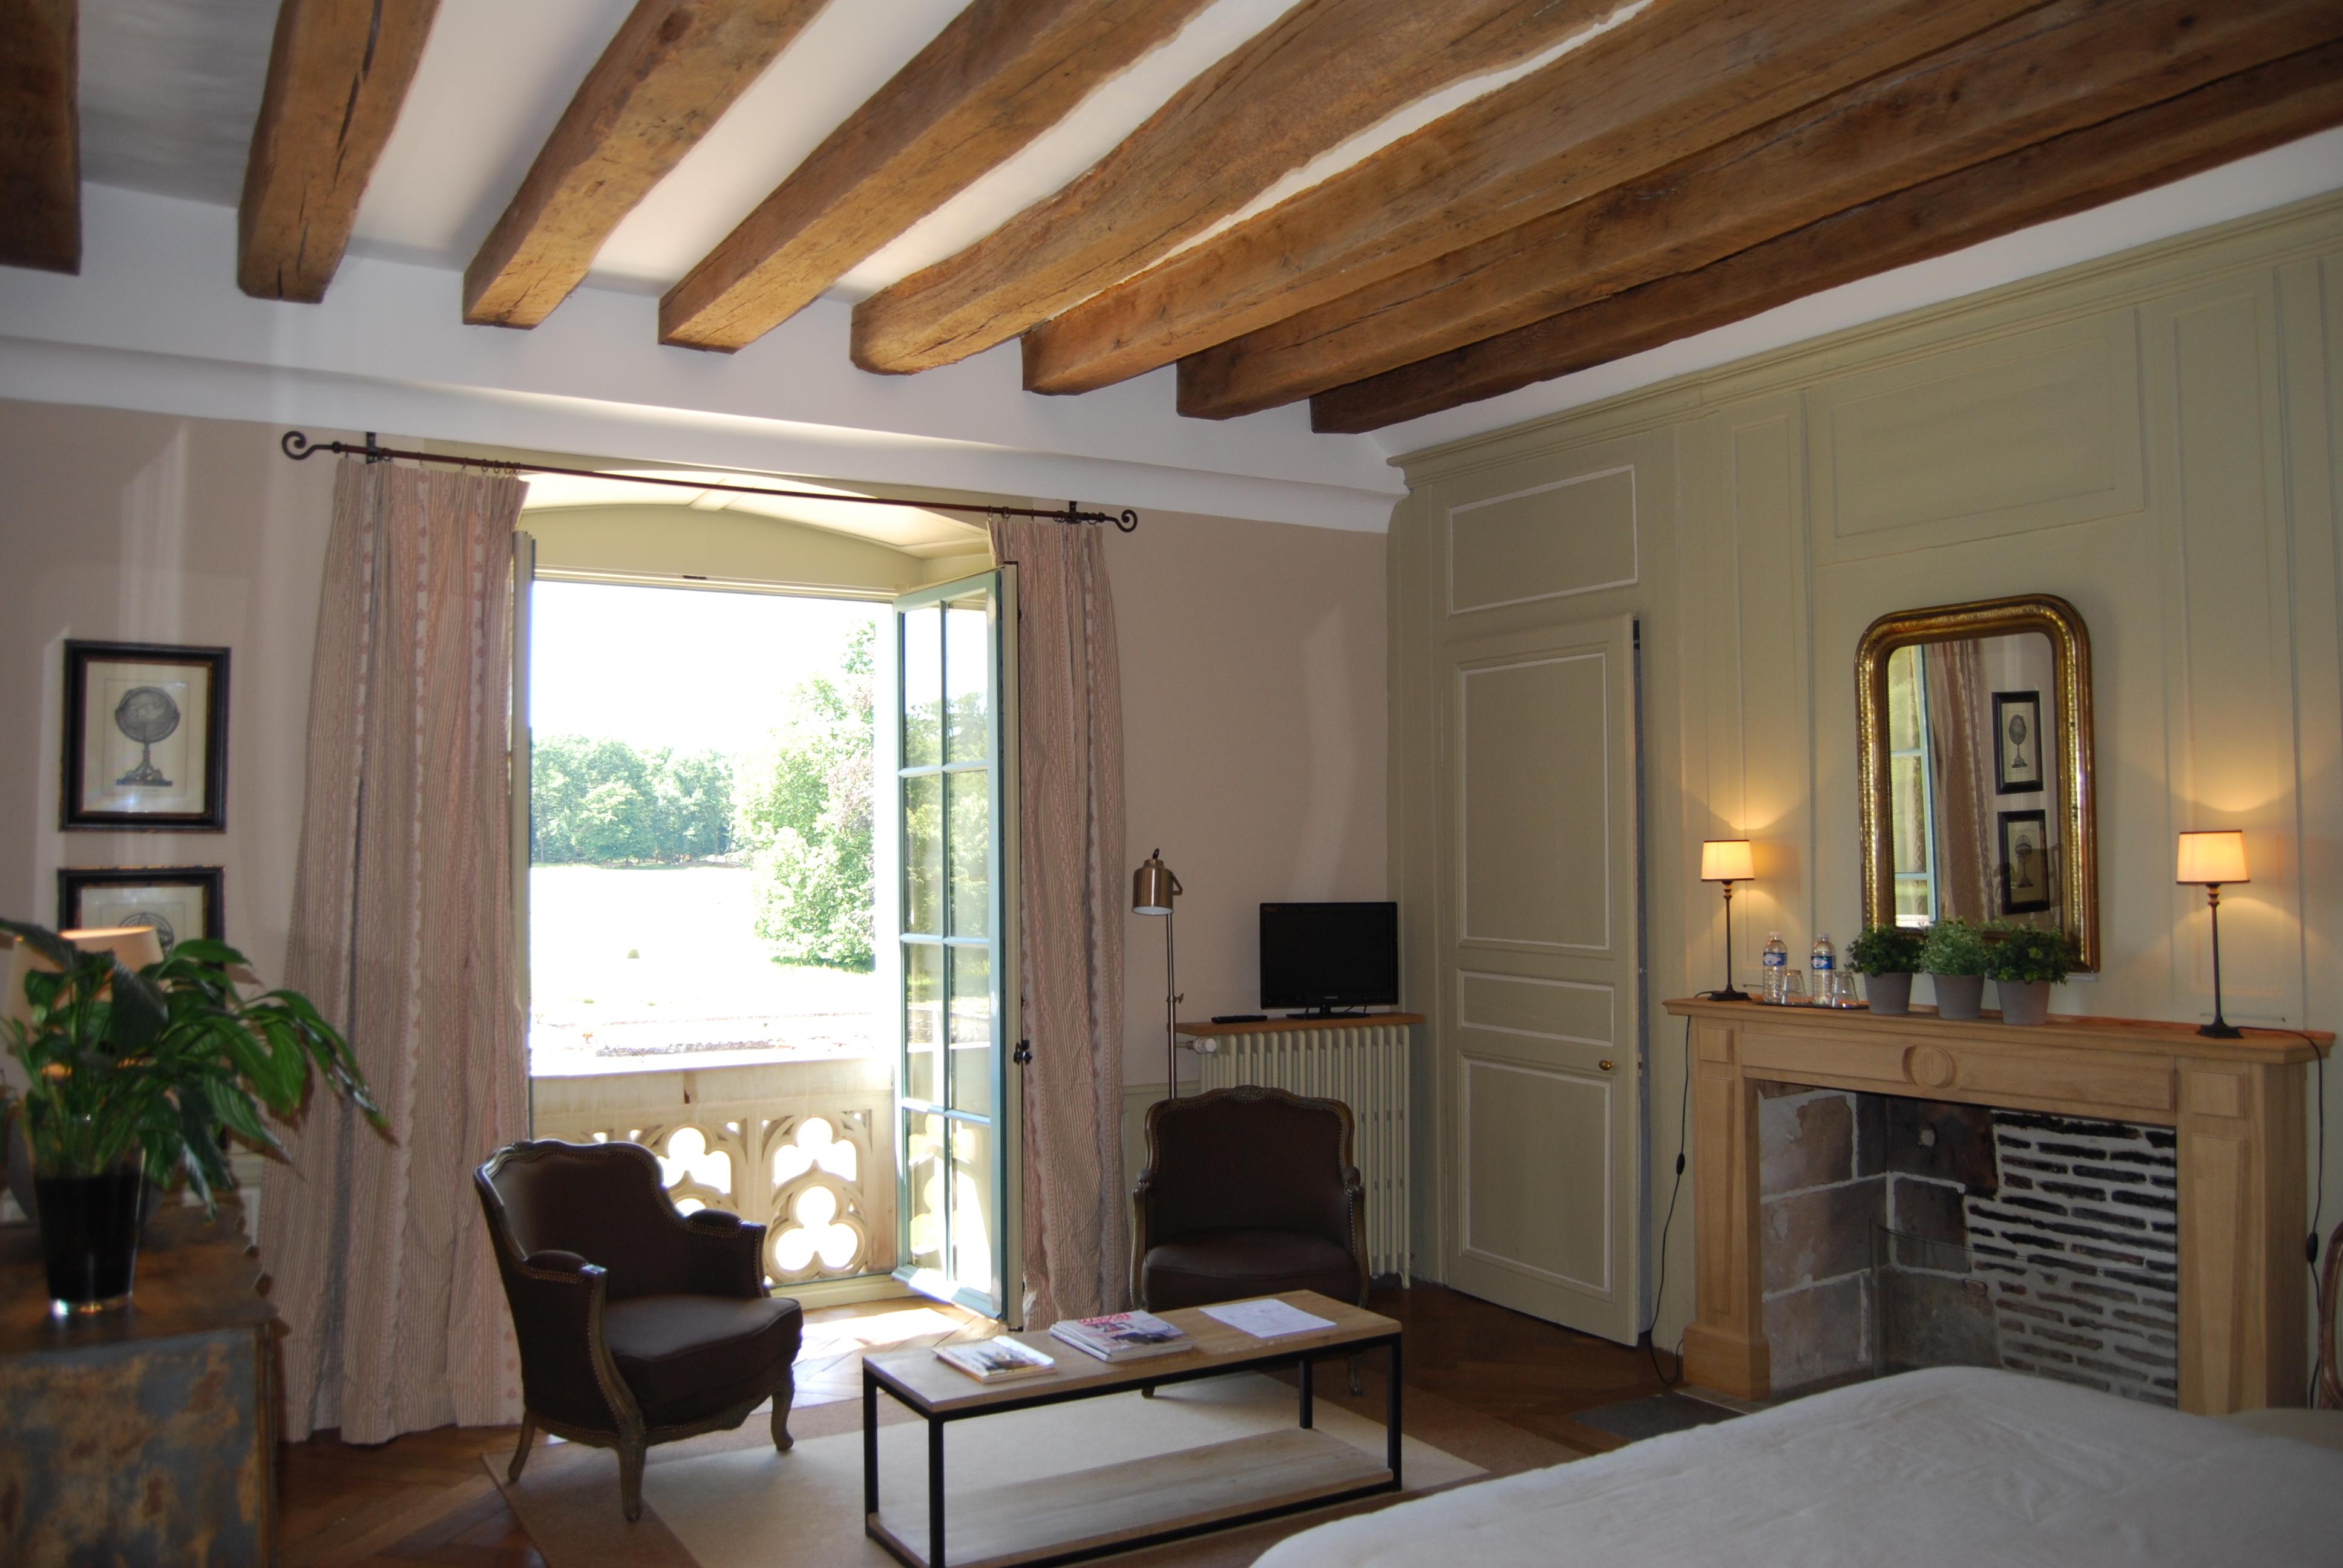 Chambre rose chateau des arpentis for Chambre rose